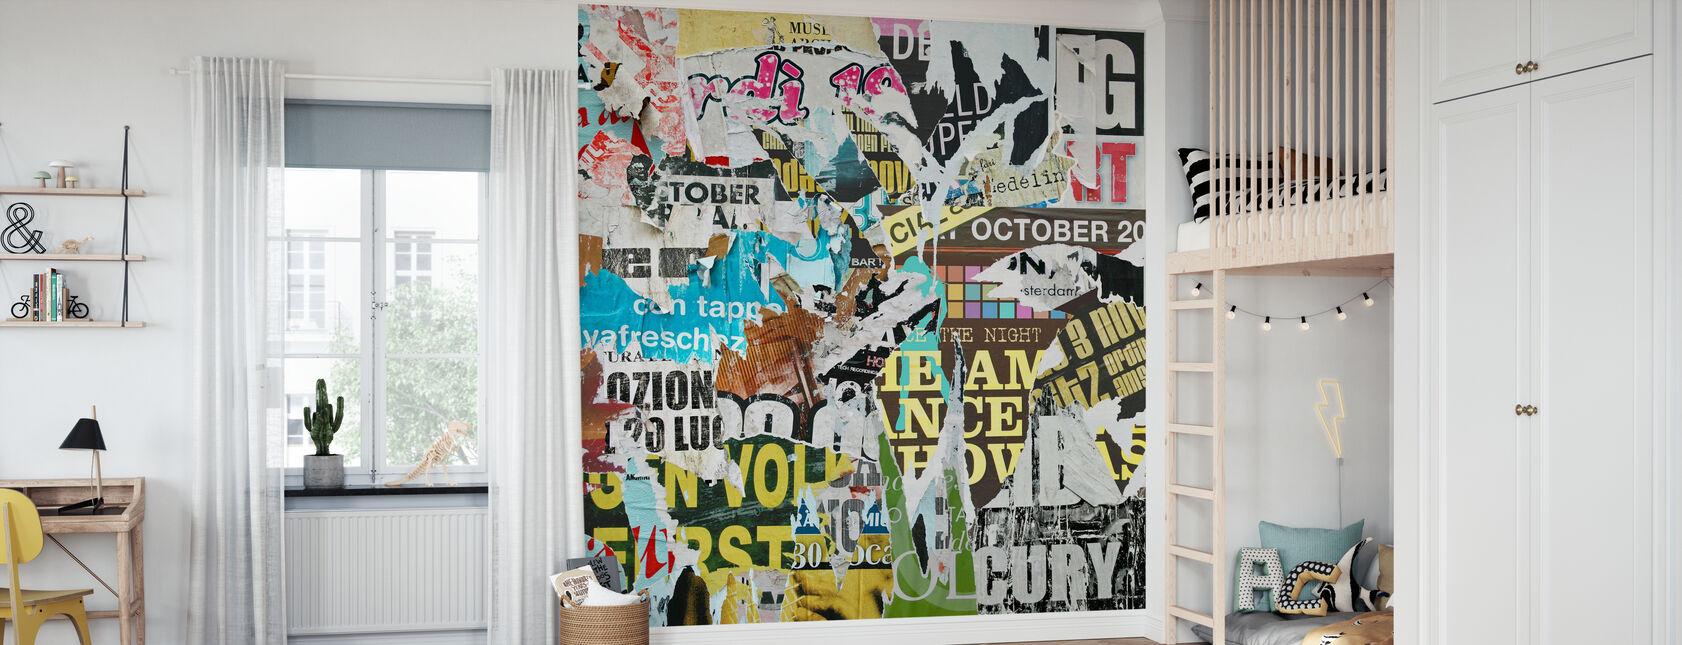 Old Torn Posters - Wallpaper - Kids Room